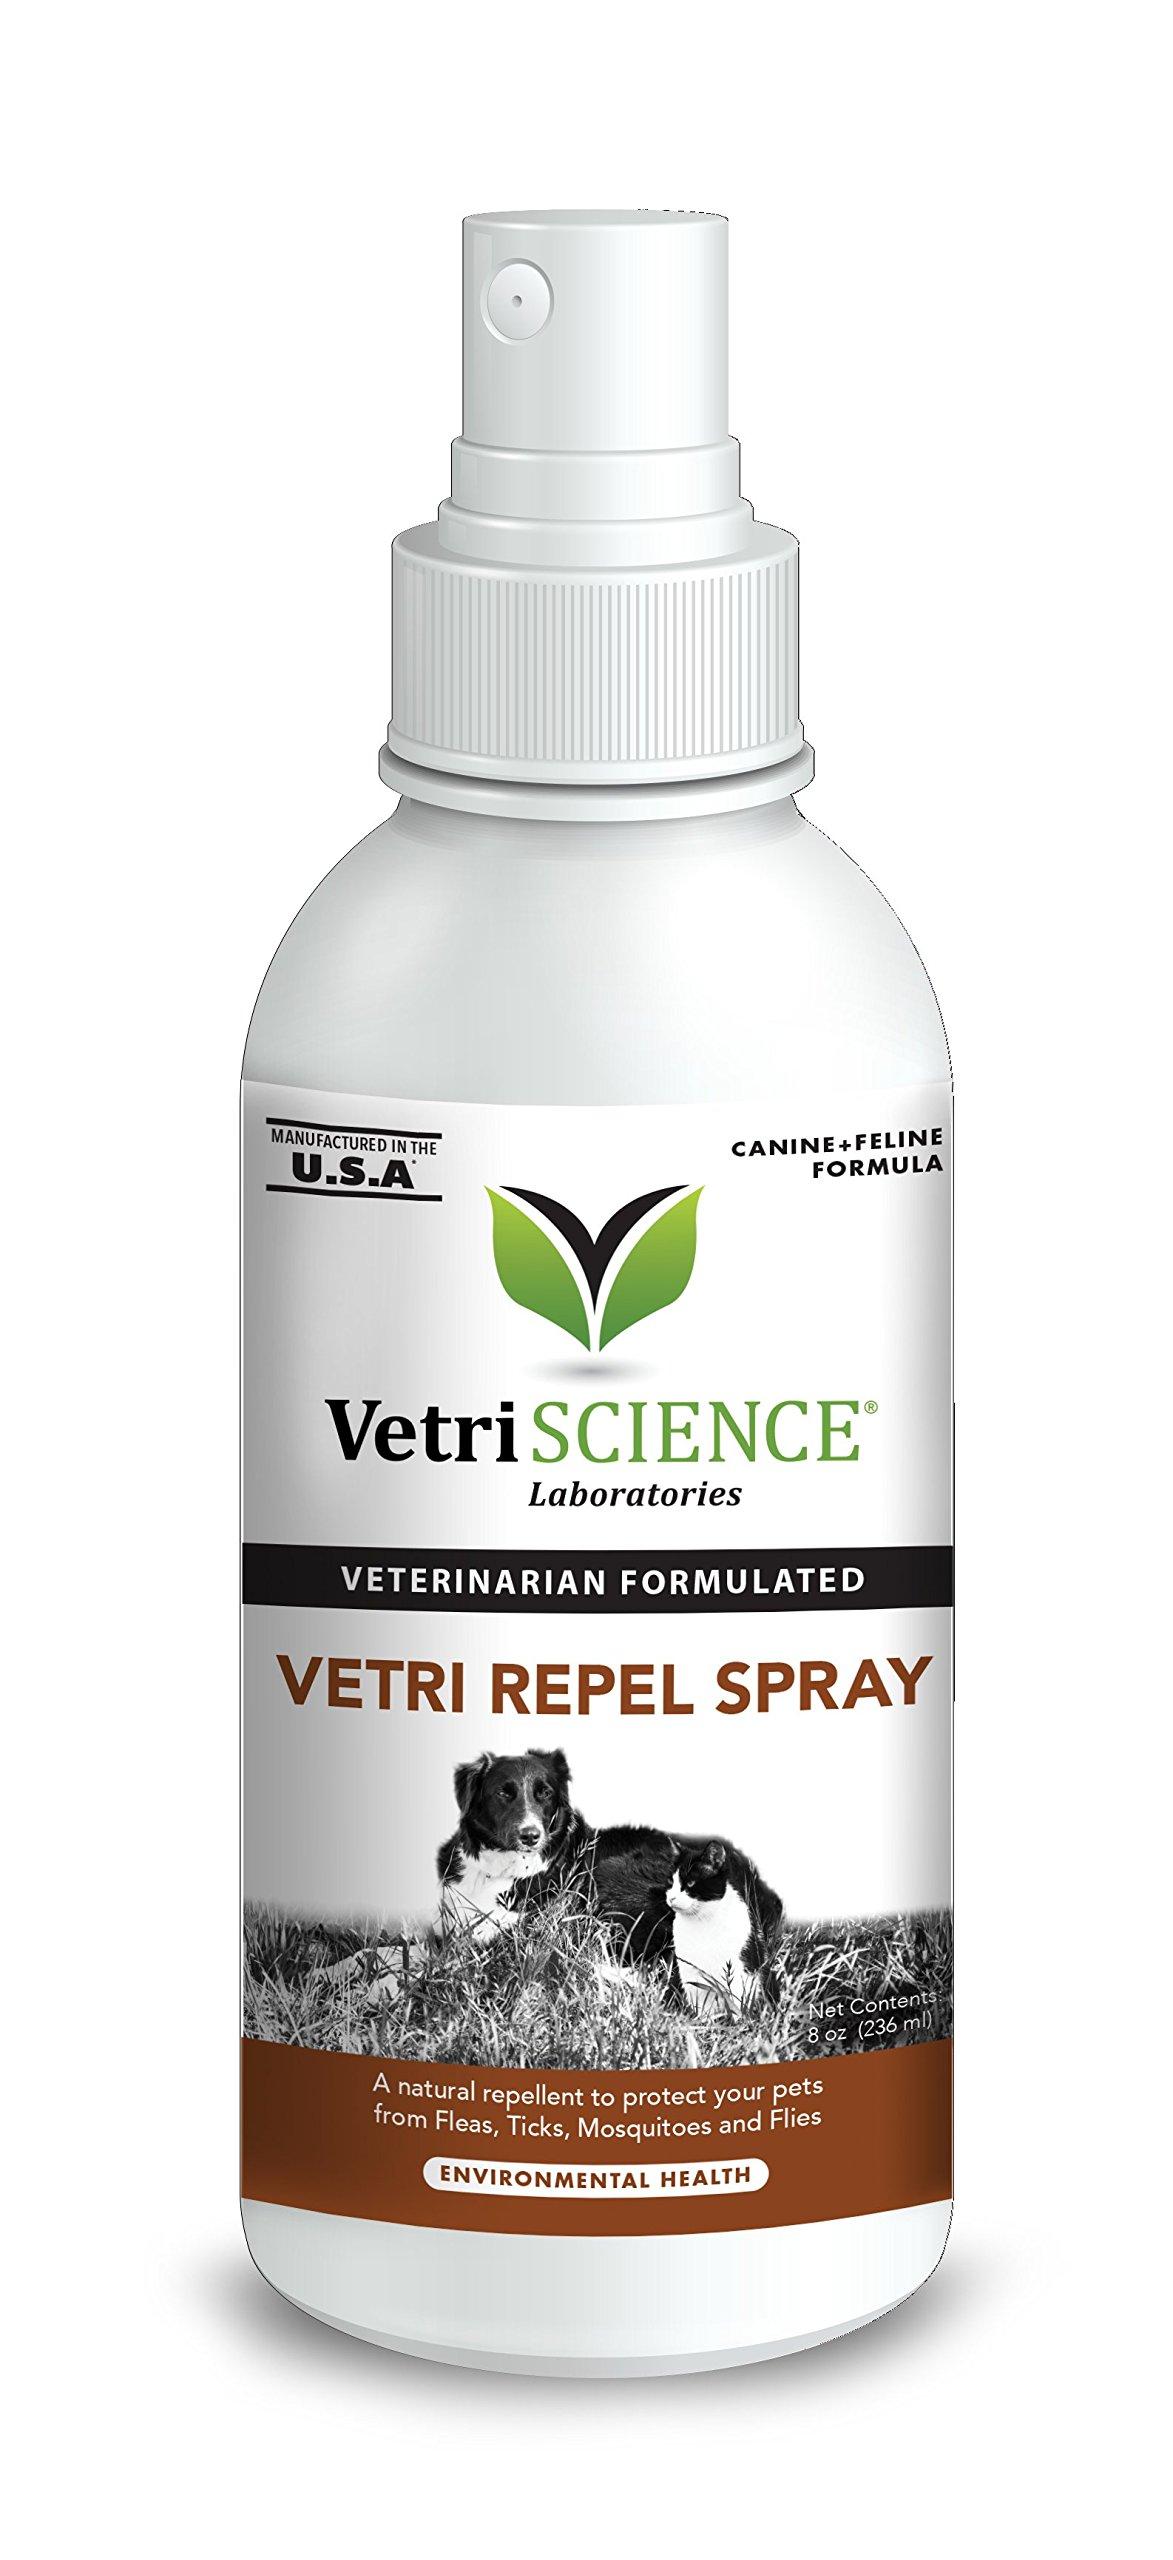 VetriScience Laboratories Vetri Repel Spray, Natural Flea and Tick Repellant for Cats and Dogs, 8oz Spray